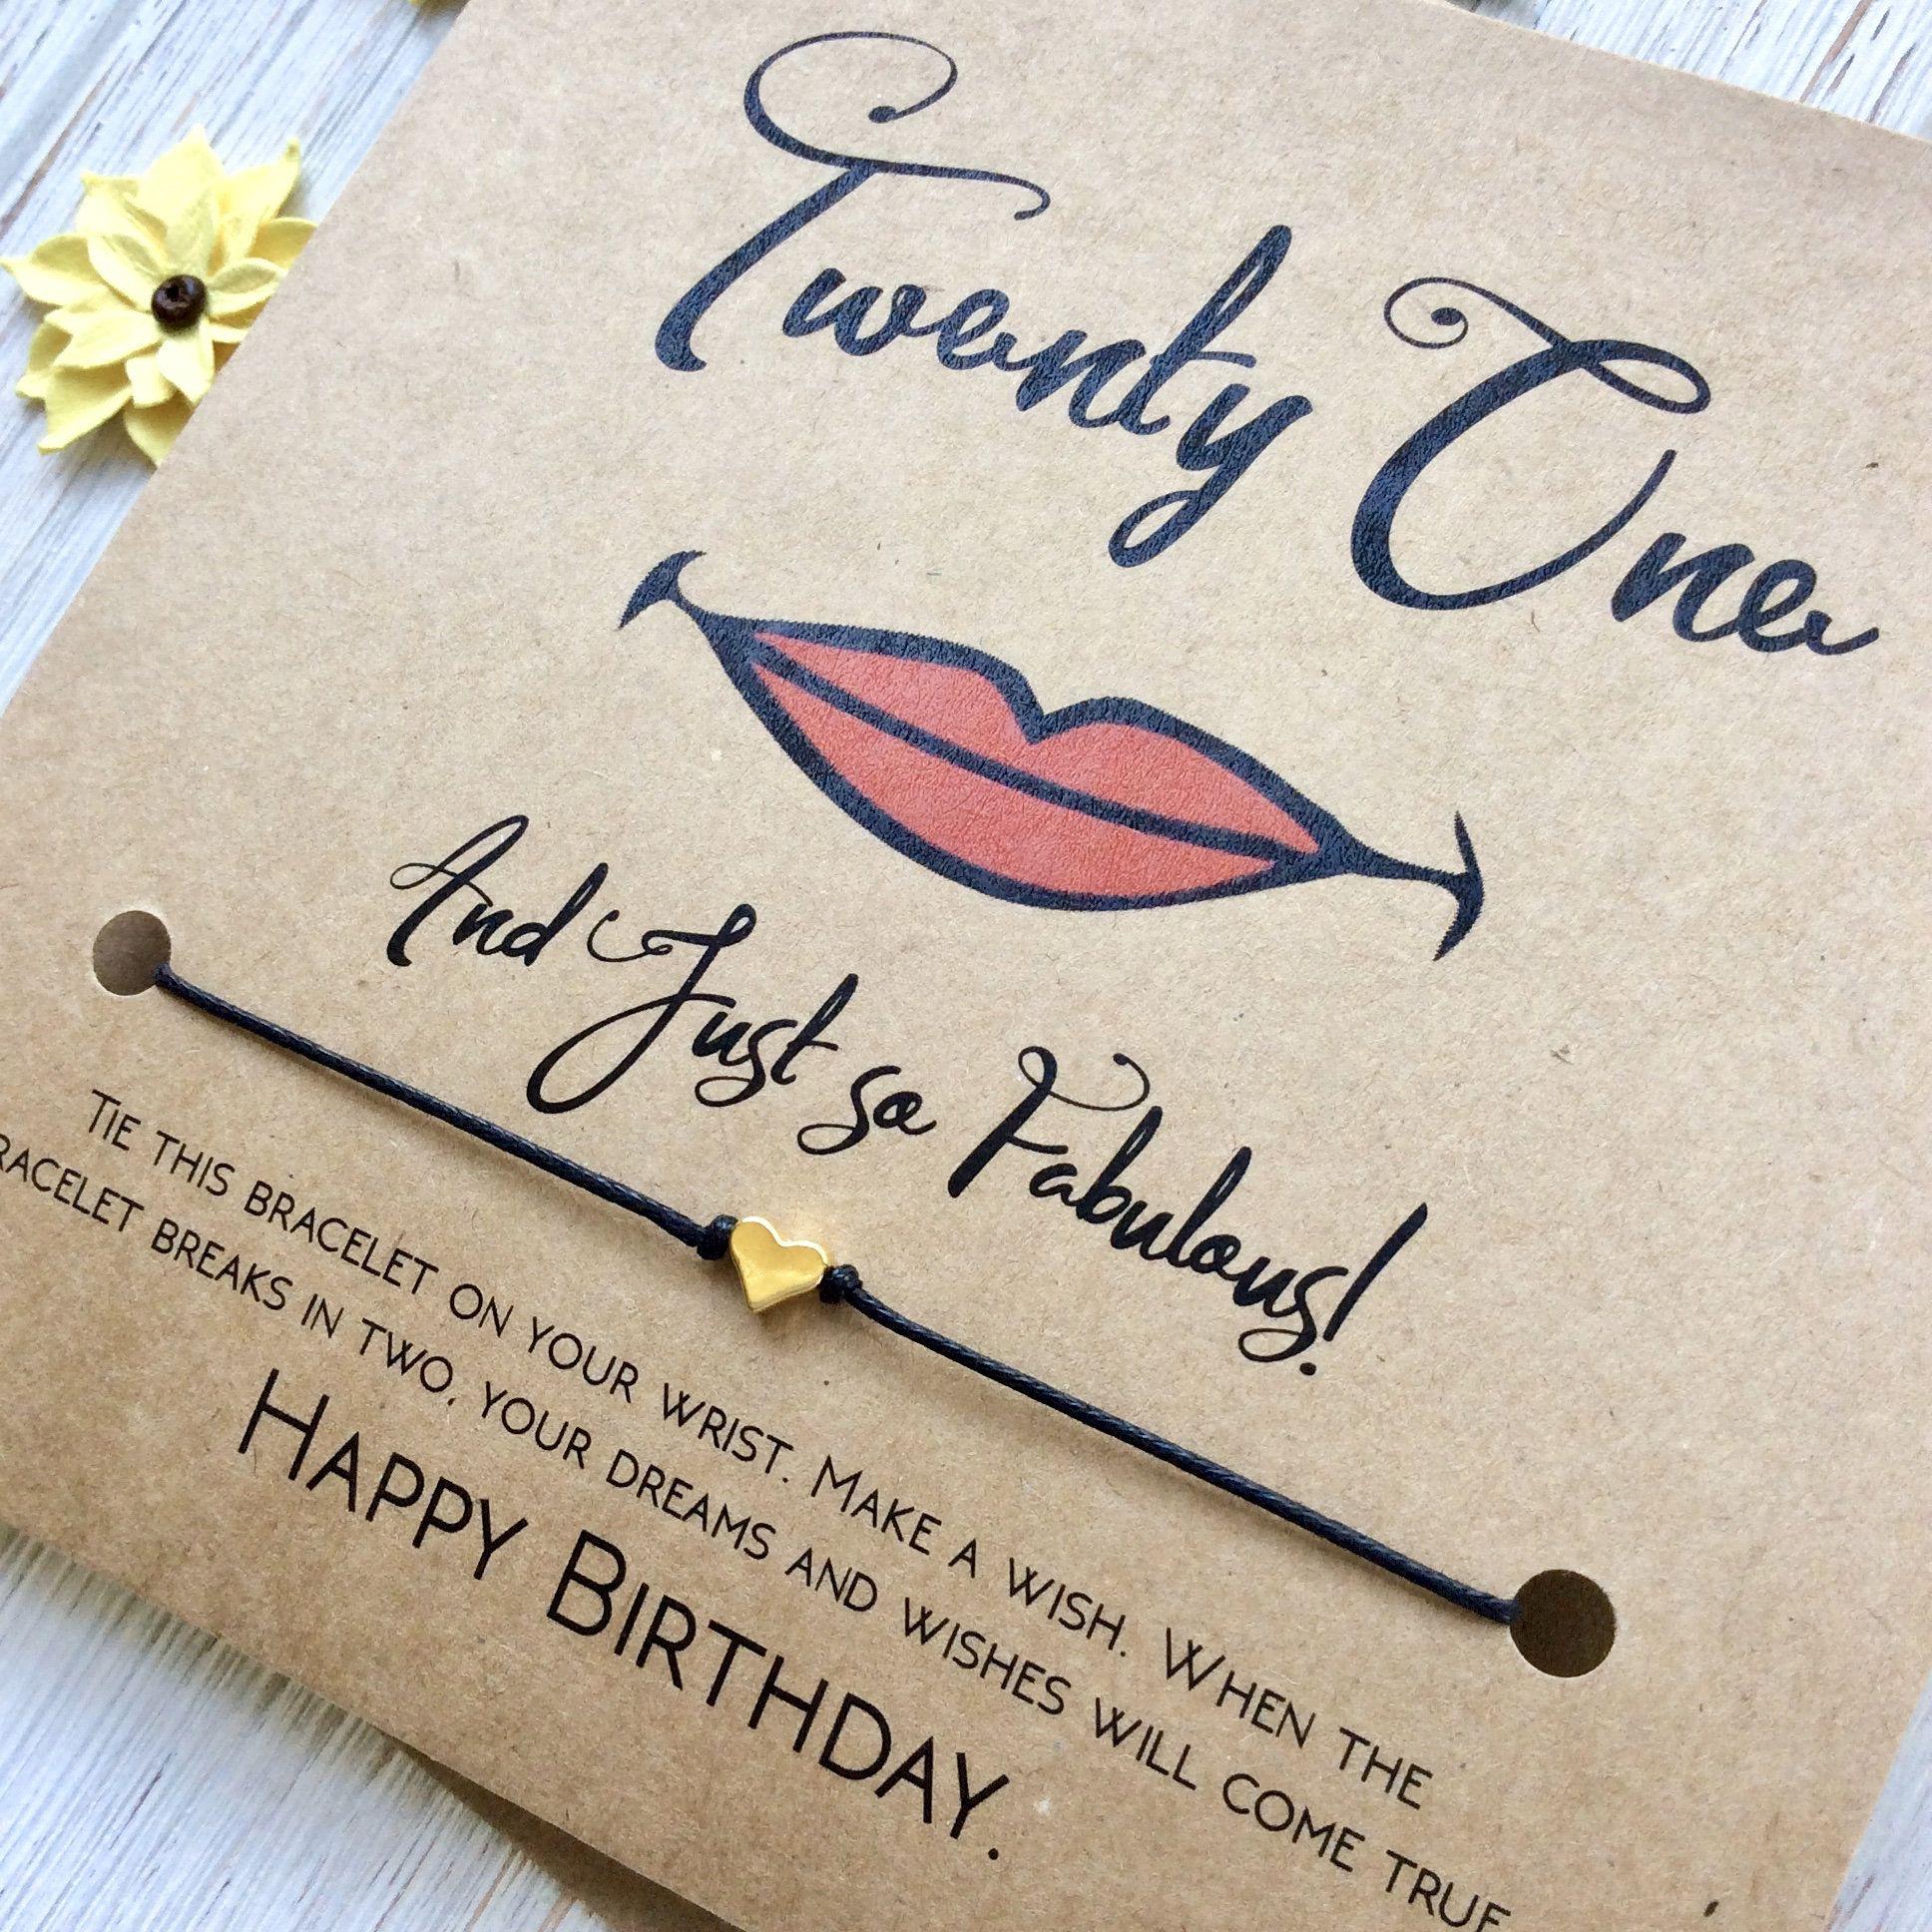 Shinning Balloon Happy 21st Birthday Card Birthday Greeting Cards By Davia Happy 21st Birthday Wishes Happy 21st Birthday Cards 21st Birthday Wishes